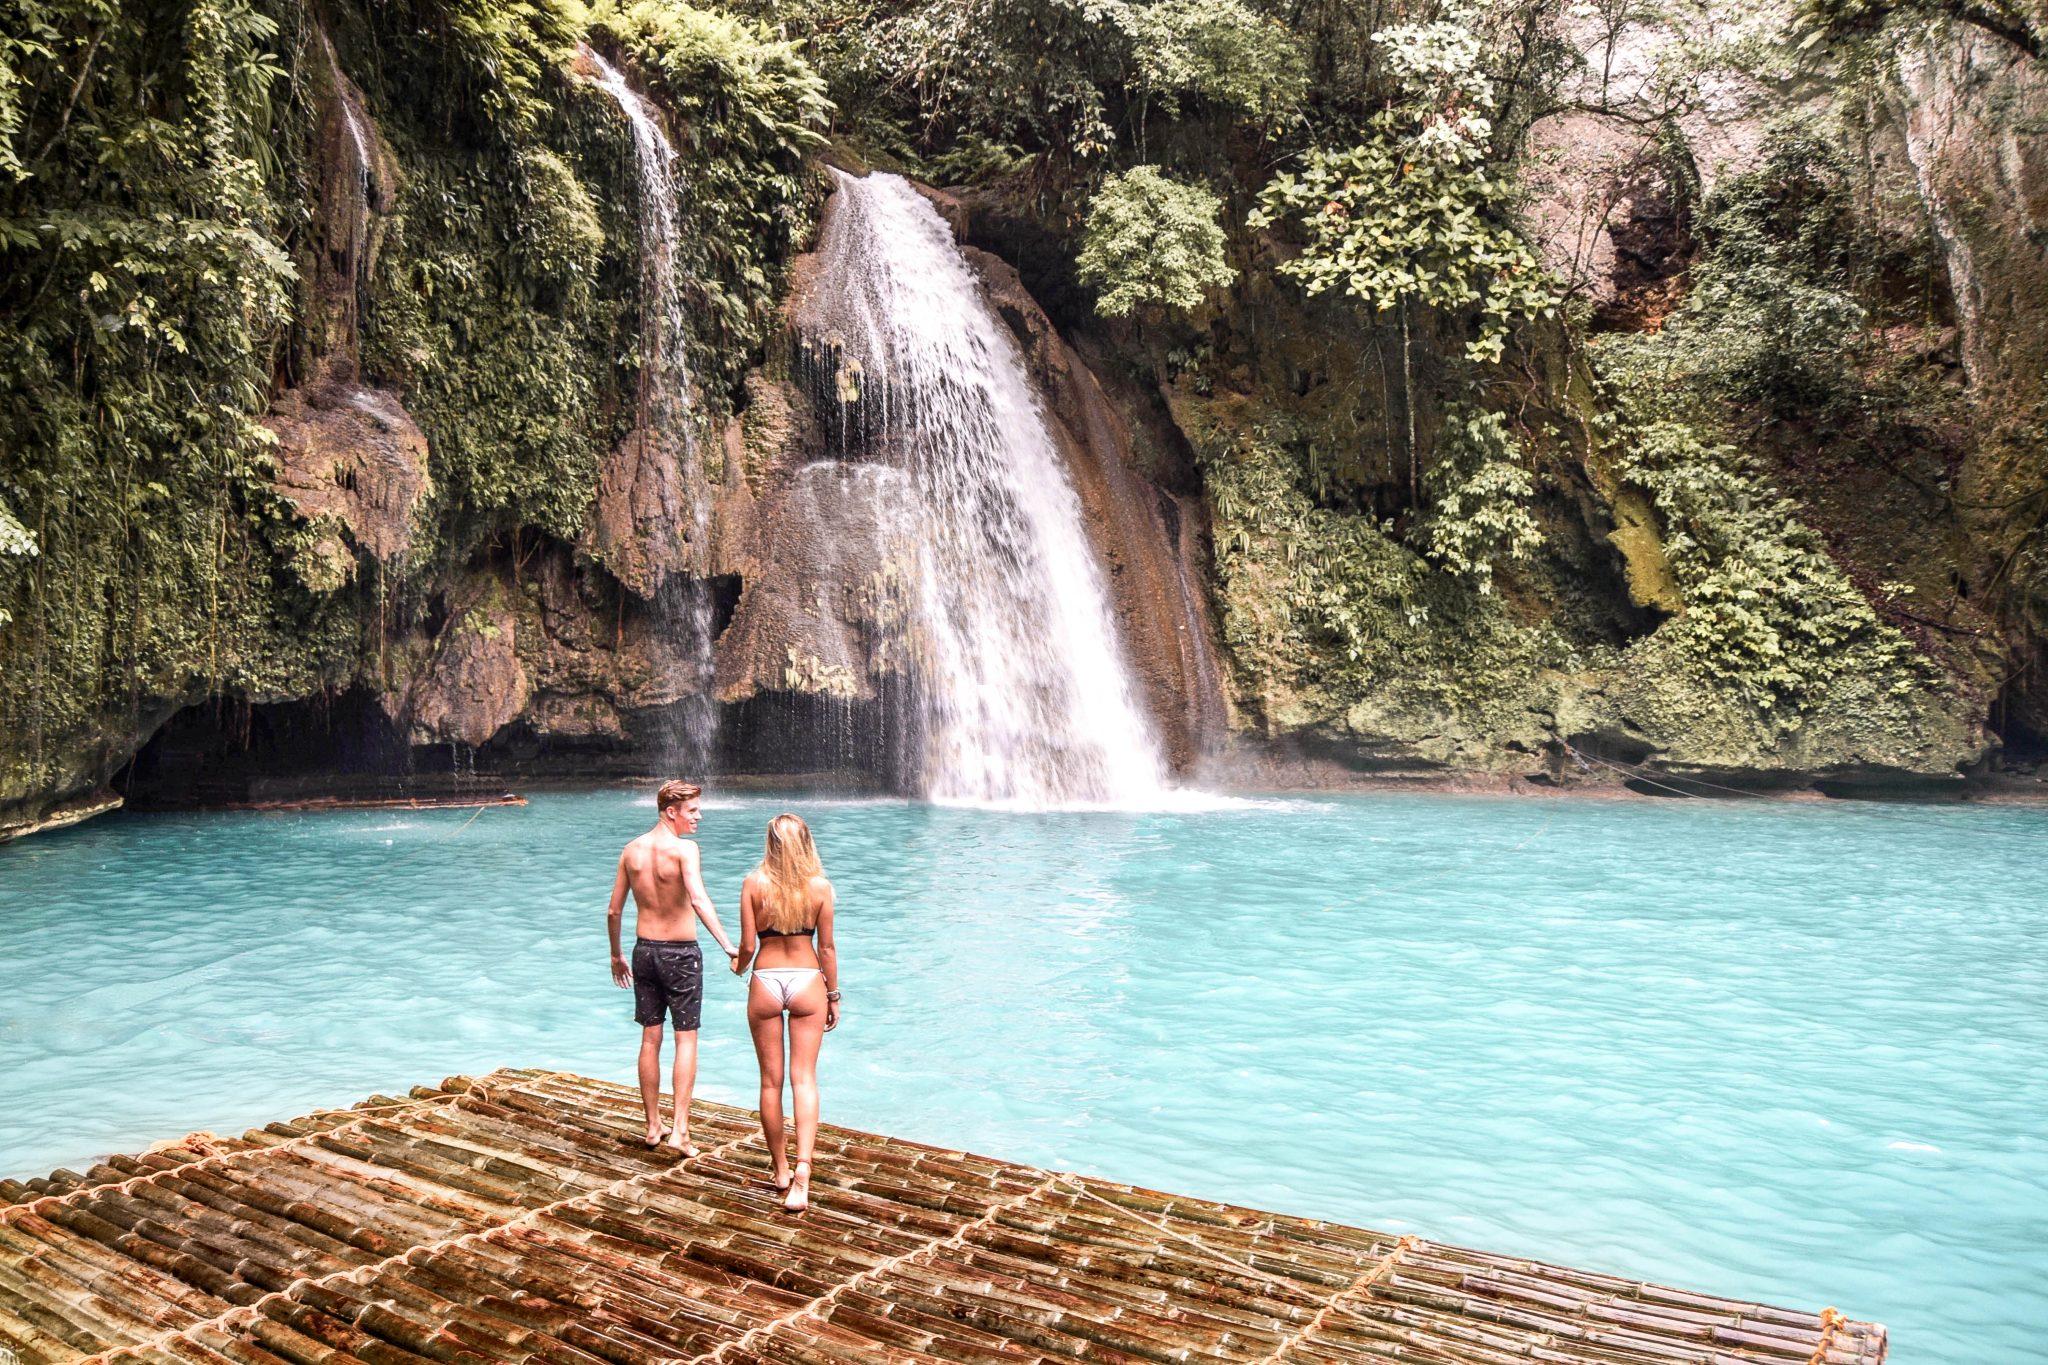 Wanderers & Warriors - Charlie & Lauren UK Travel Couple - Kawasan Falls Cebu Philippines - Kawasan Falls & More Things To Do In Moalboal